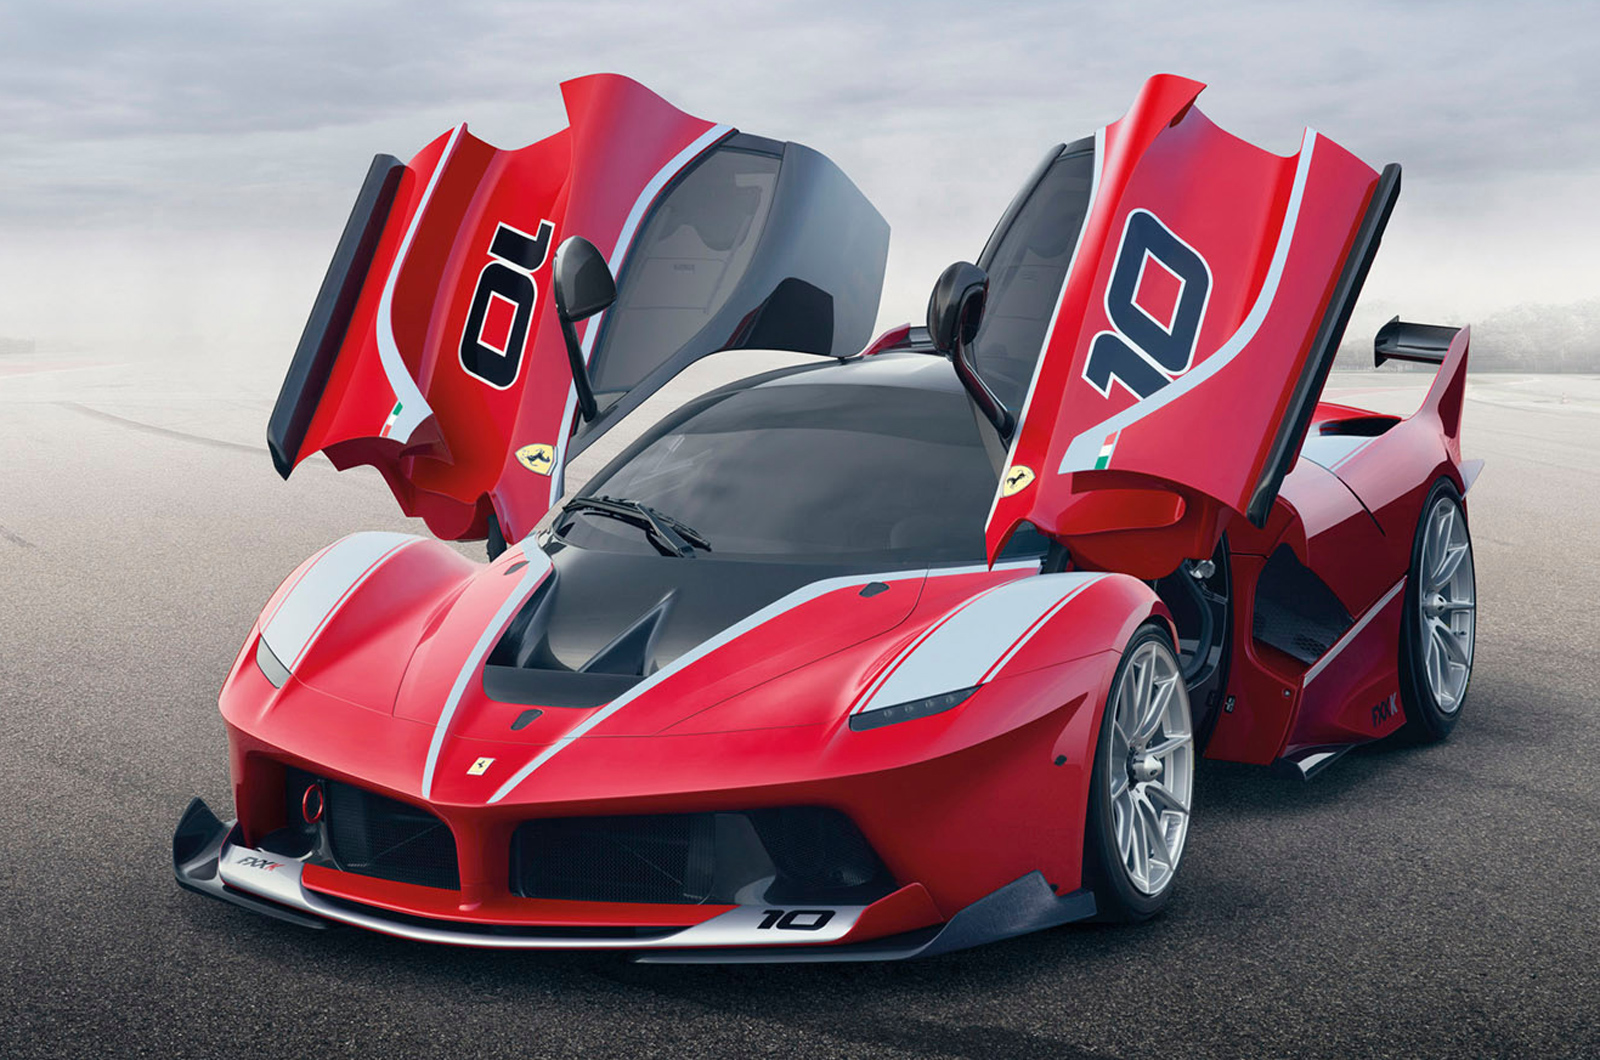 2018 Ferrari Monza SP1, HD Cars, 4k Wallpapers, Images